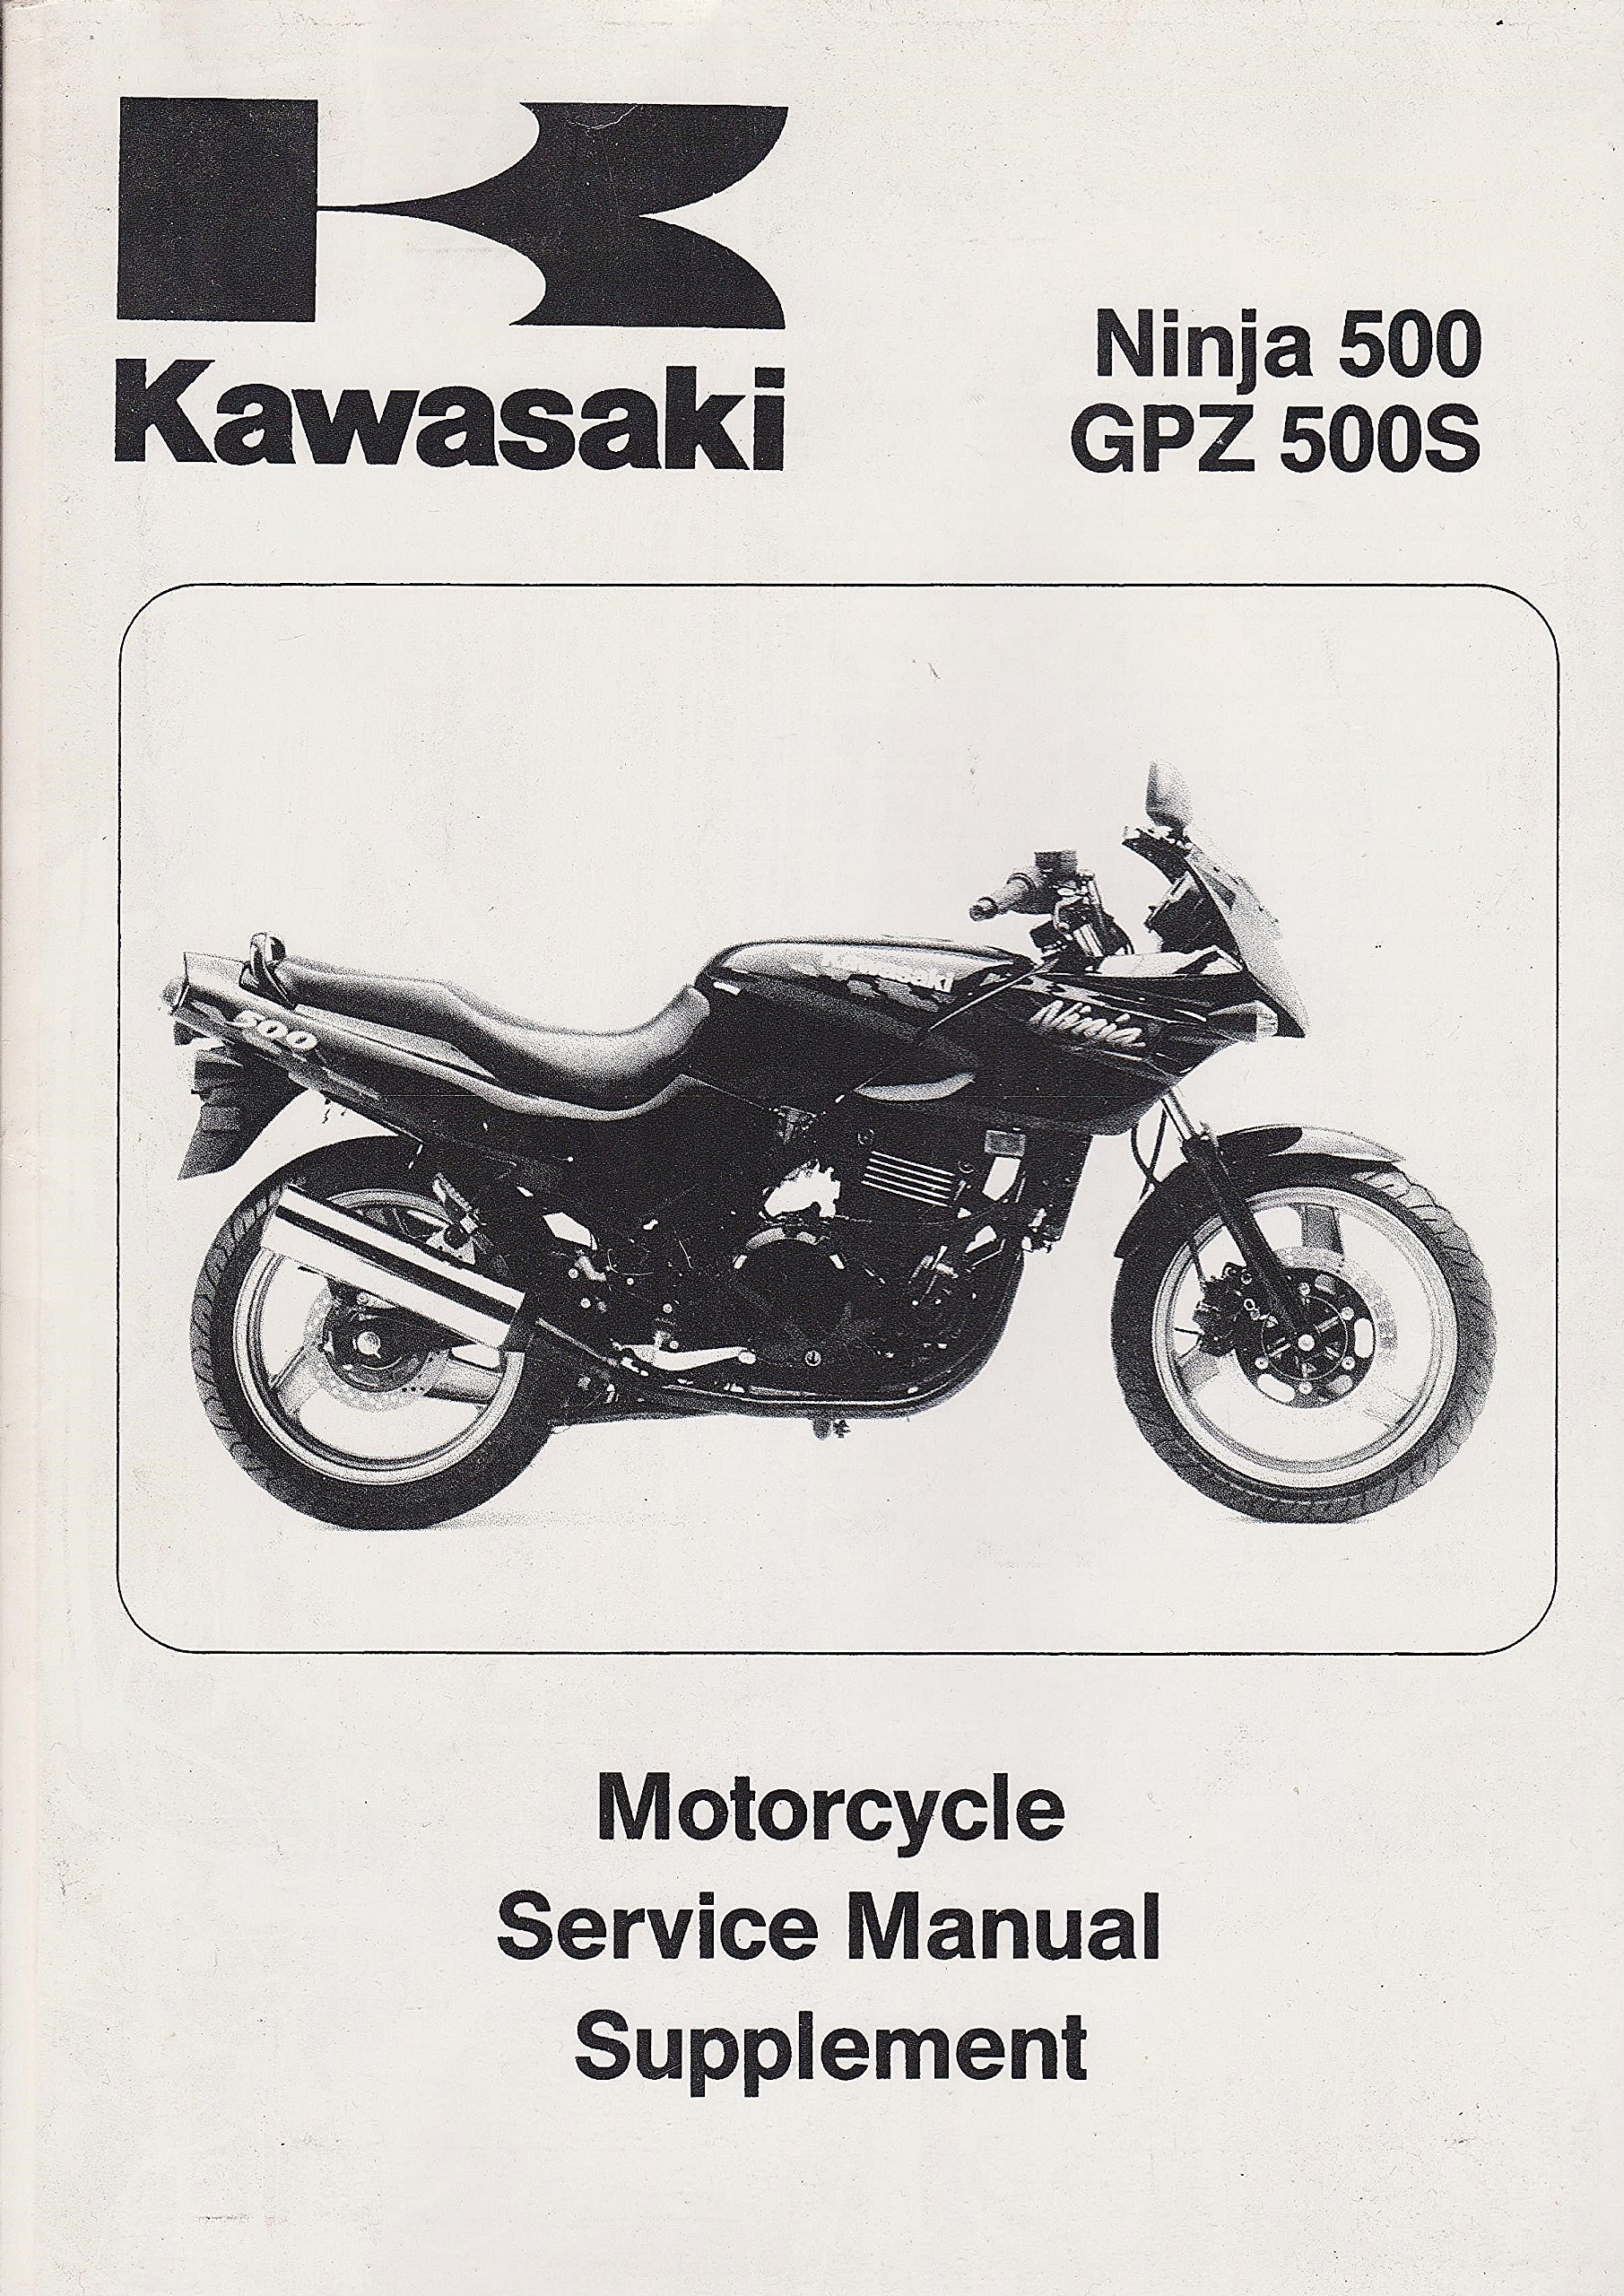 Kawasaki Ninja 500, GPZ 500S Manual, 1994-99, plus ...